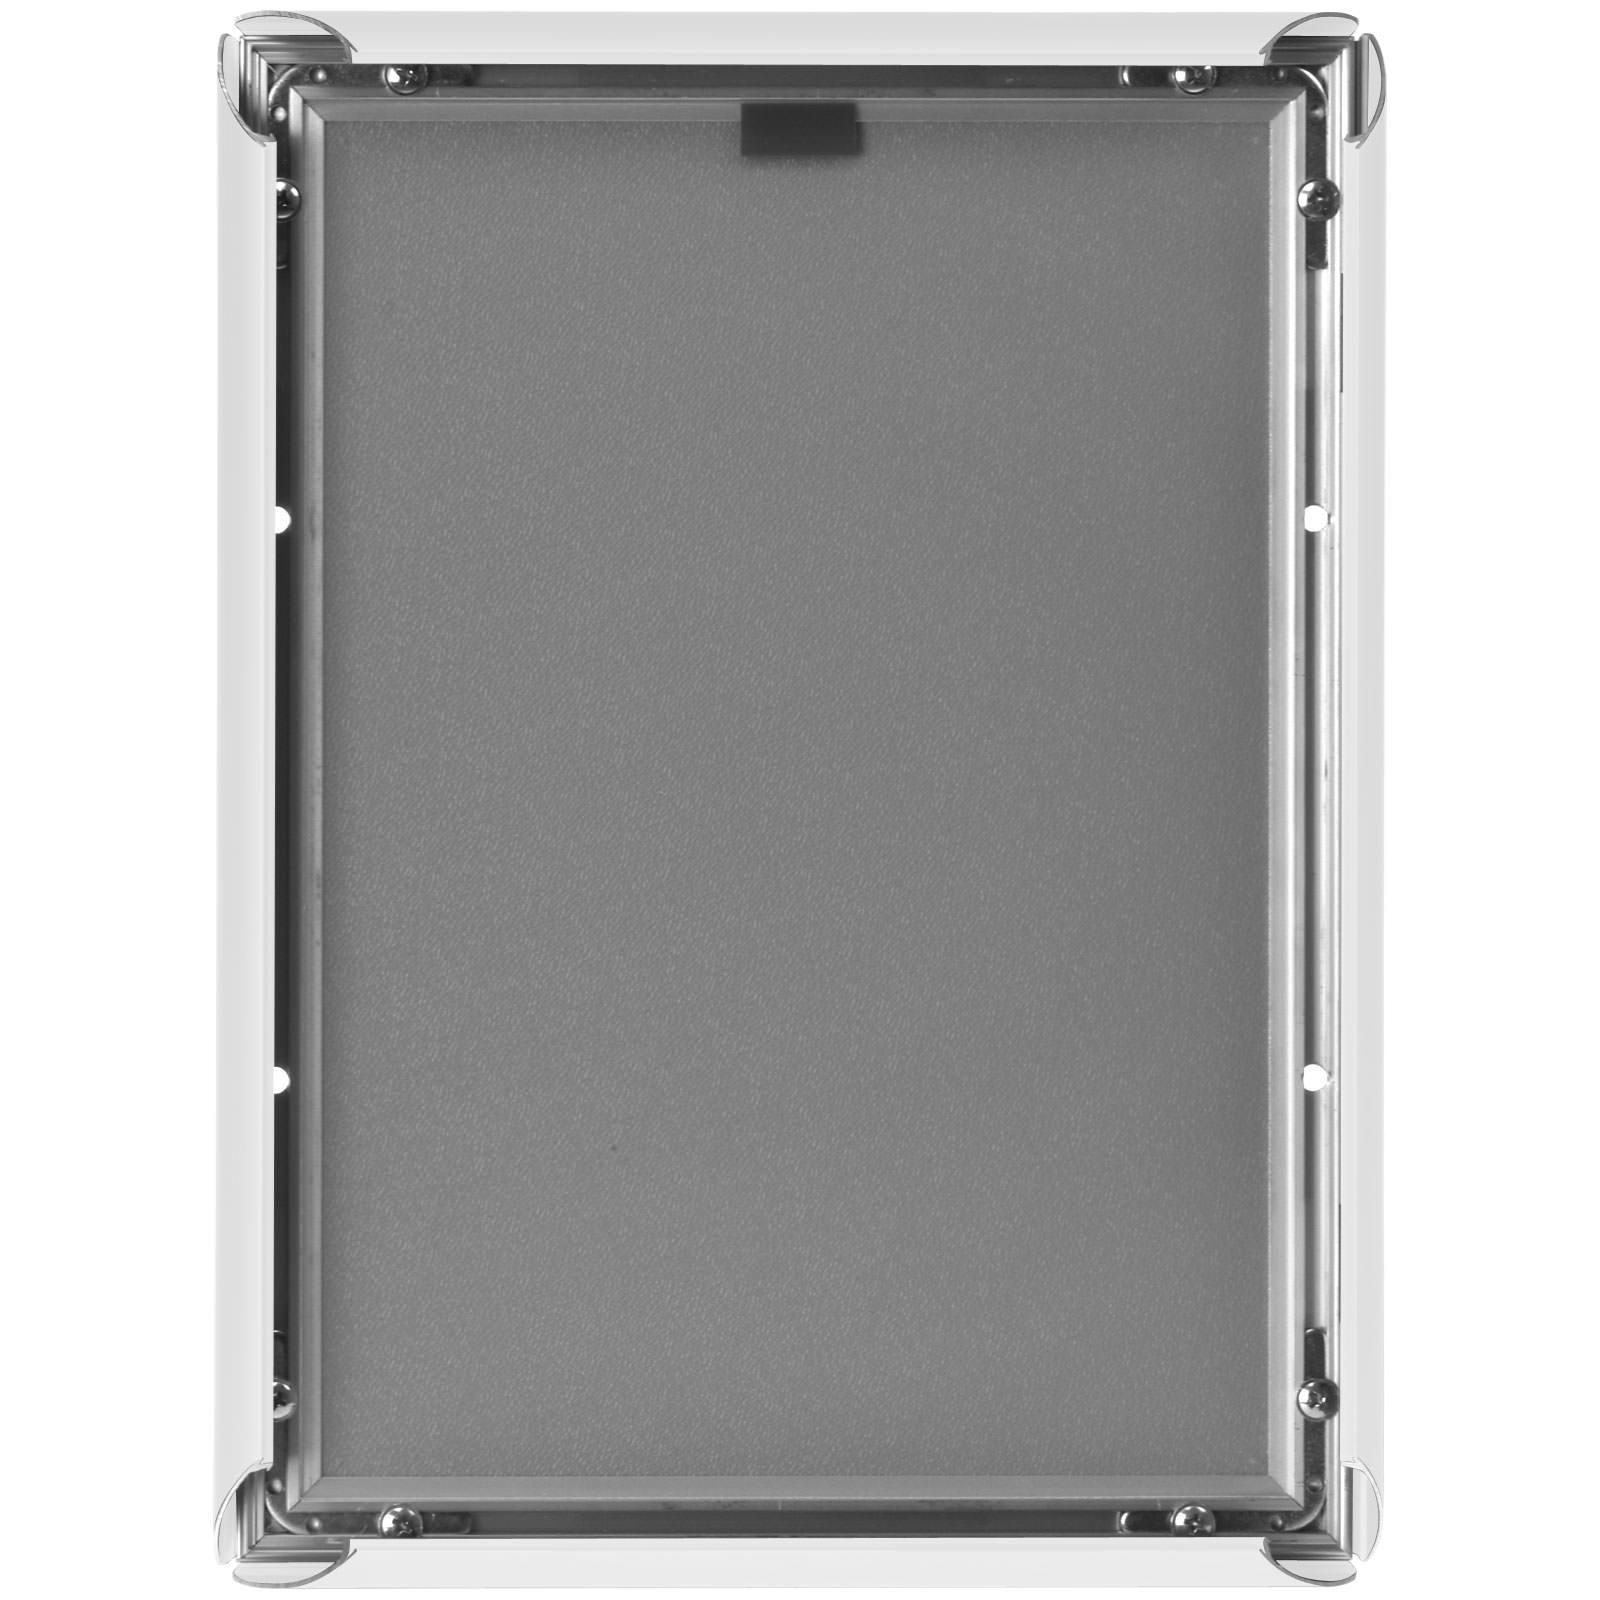 klapprahmen wei auf gehrung a4 a3 a2 a1 snap frame 25mm. Black Bedroom Furniture Sets. Home Design Ideas